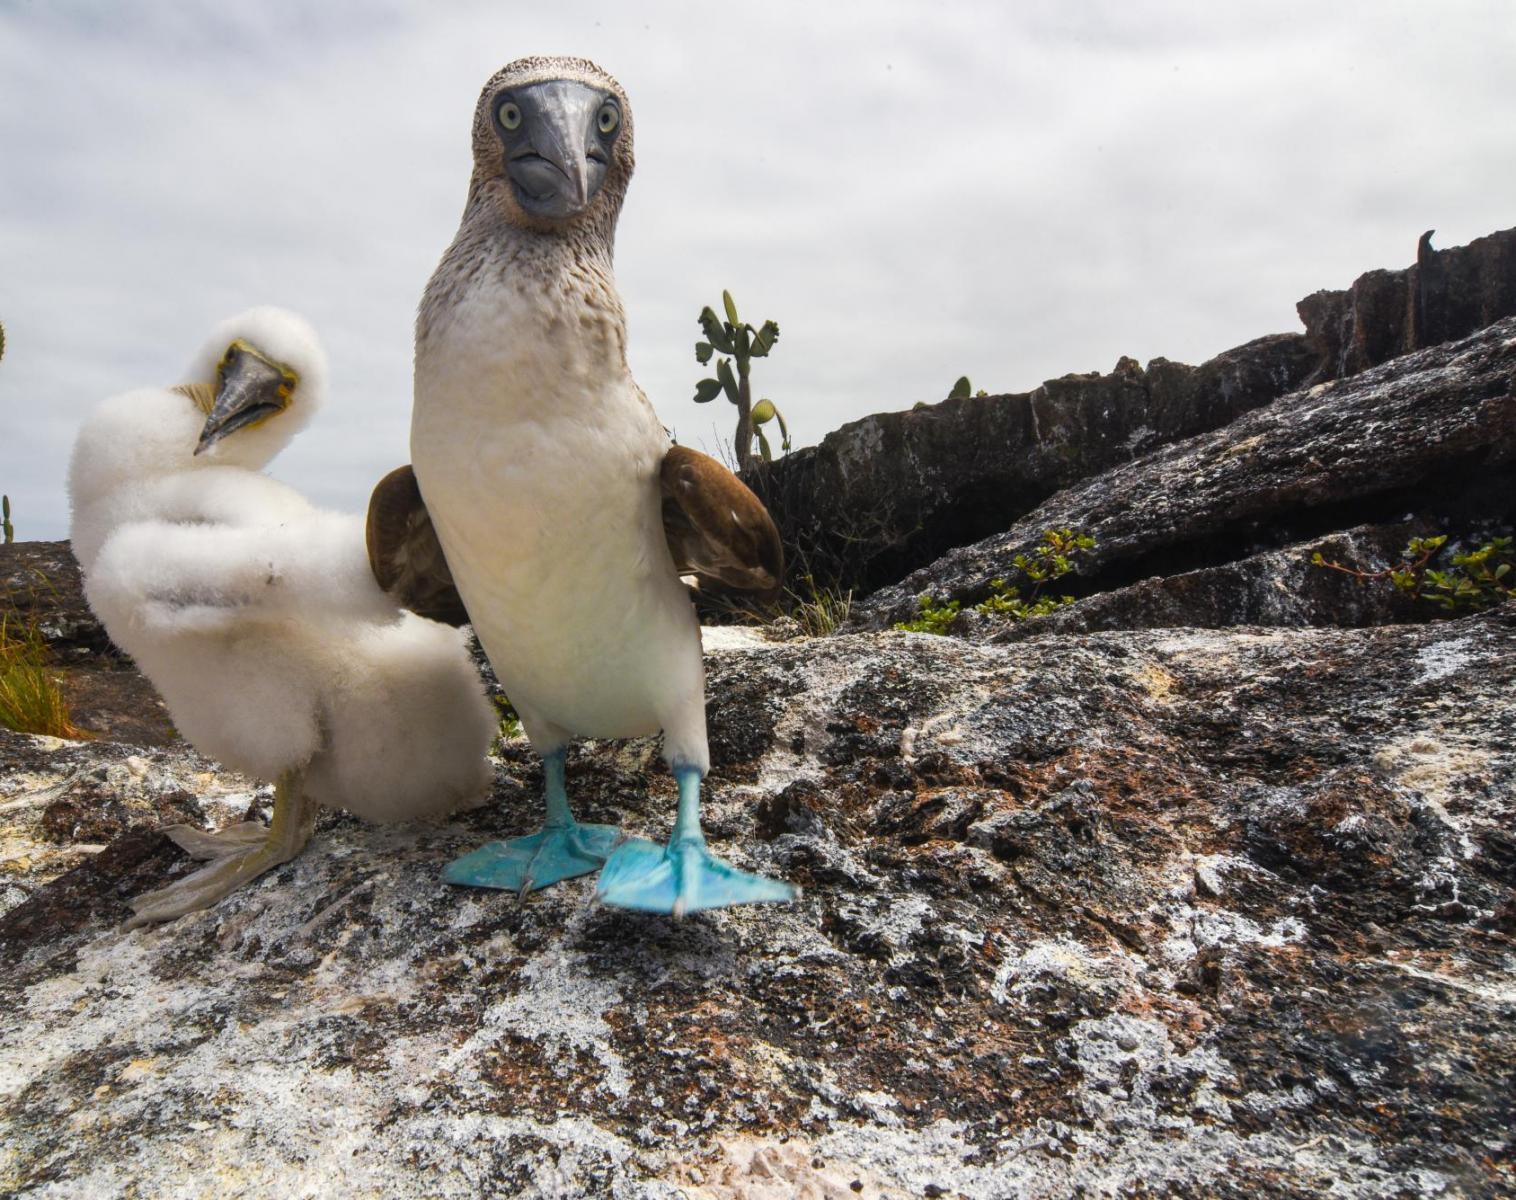 Équateur  Spécial Galapagos et Isla Plata   Photo Observation nature Navigation Apnée & Plongée  Balade nature